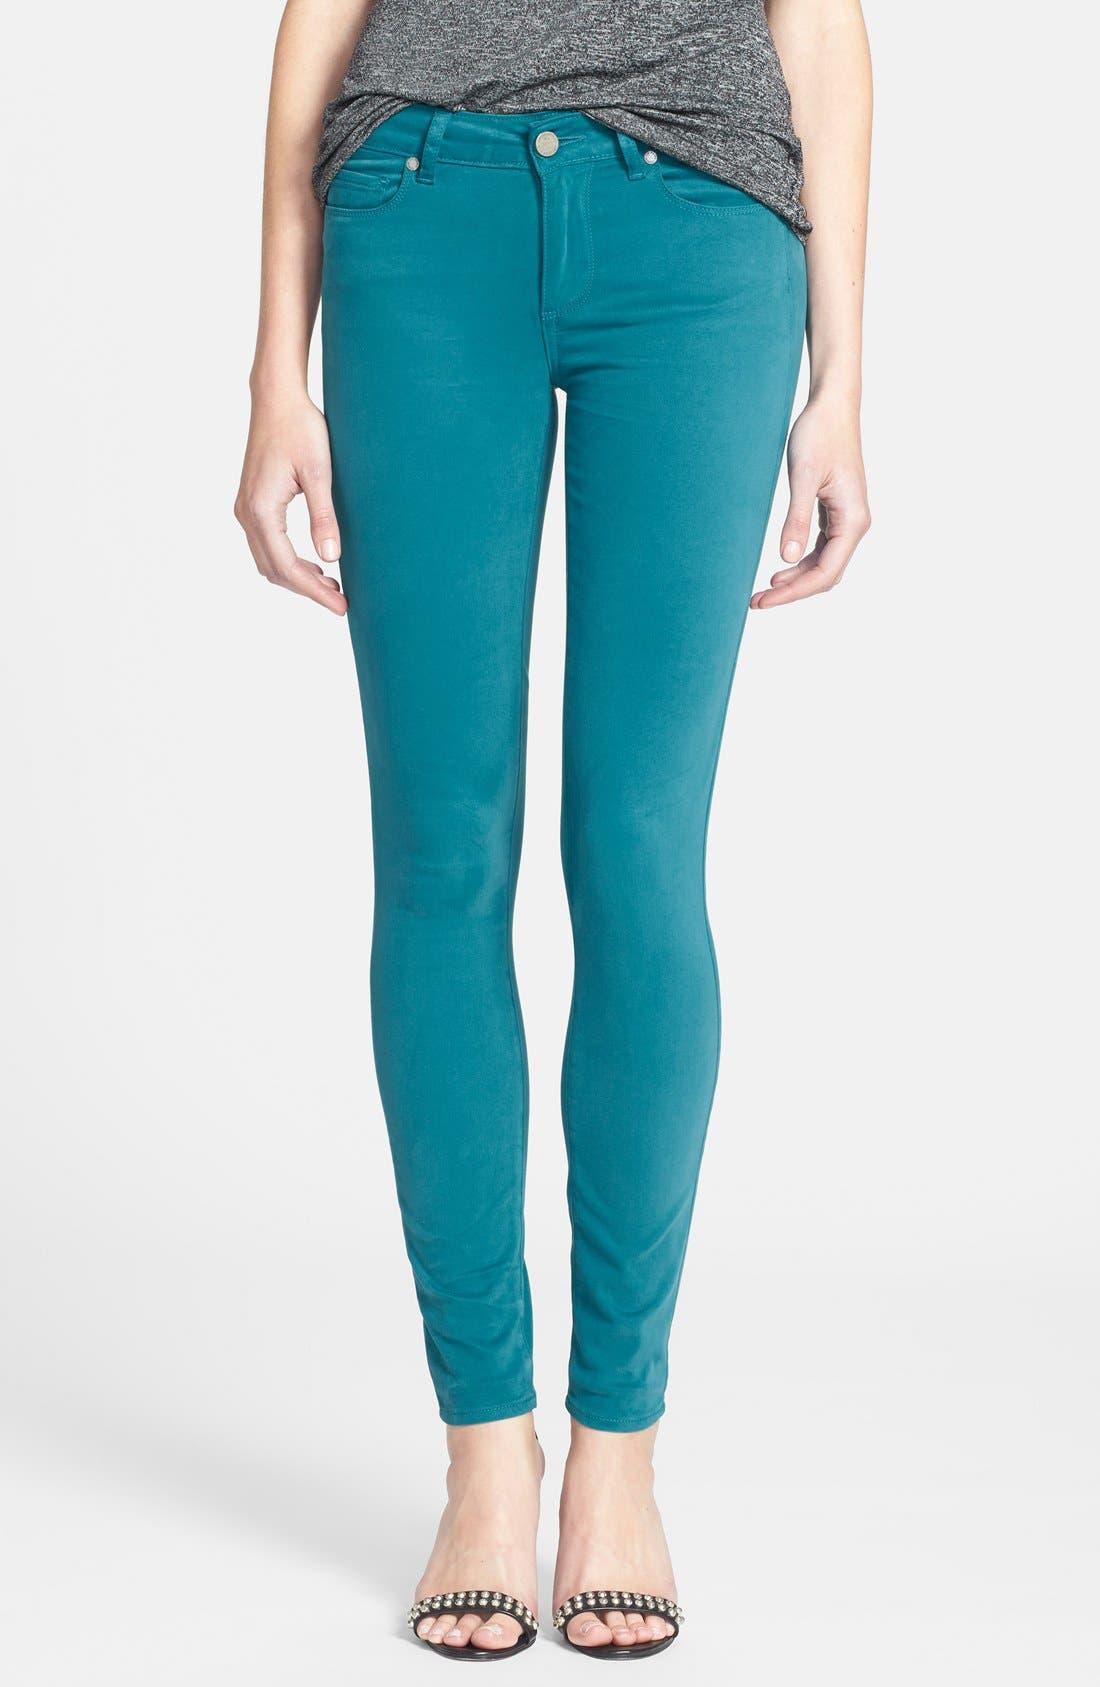 Alternate Image 1 Selected - Paige Denim 'Verdugo' Ultra Skinny Jeans (Deep Turquoise)